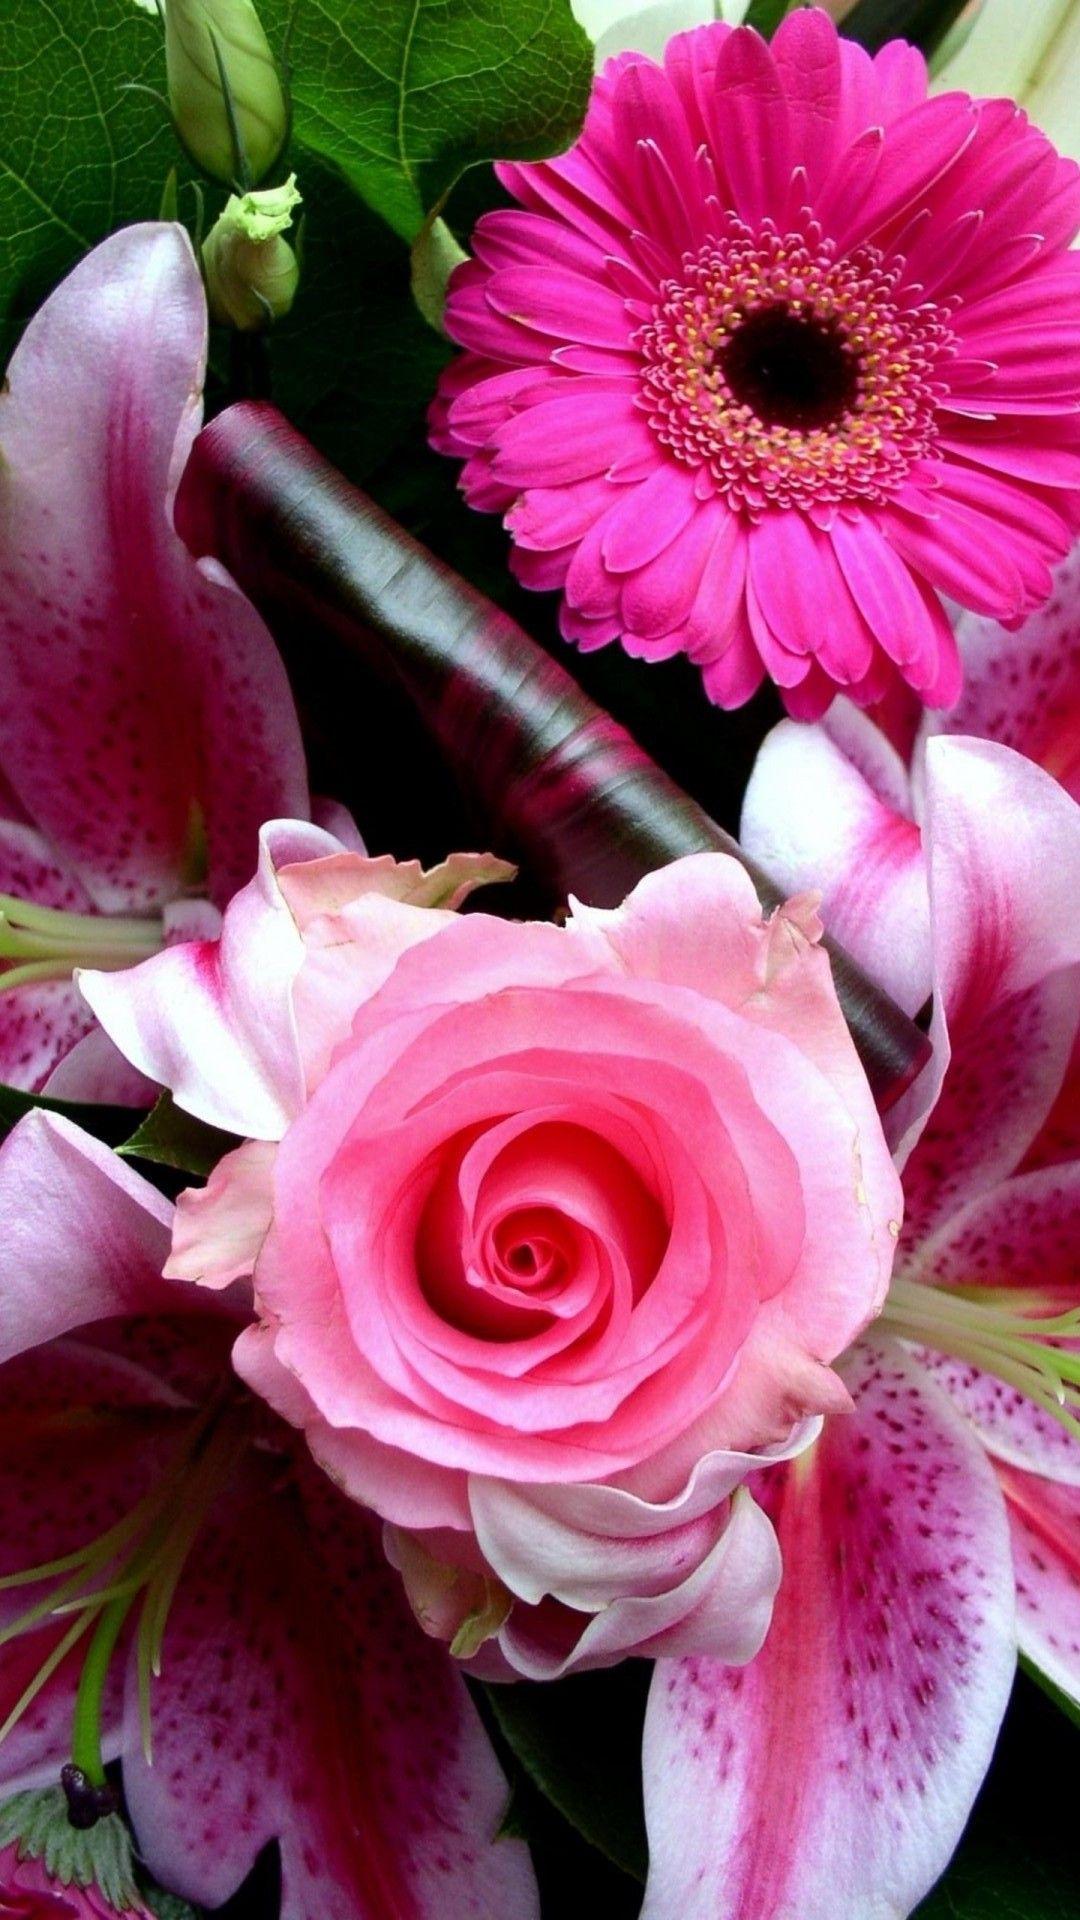 Iphone Wallpaper Hd Pink Flower Best Hd Wallpapers